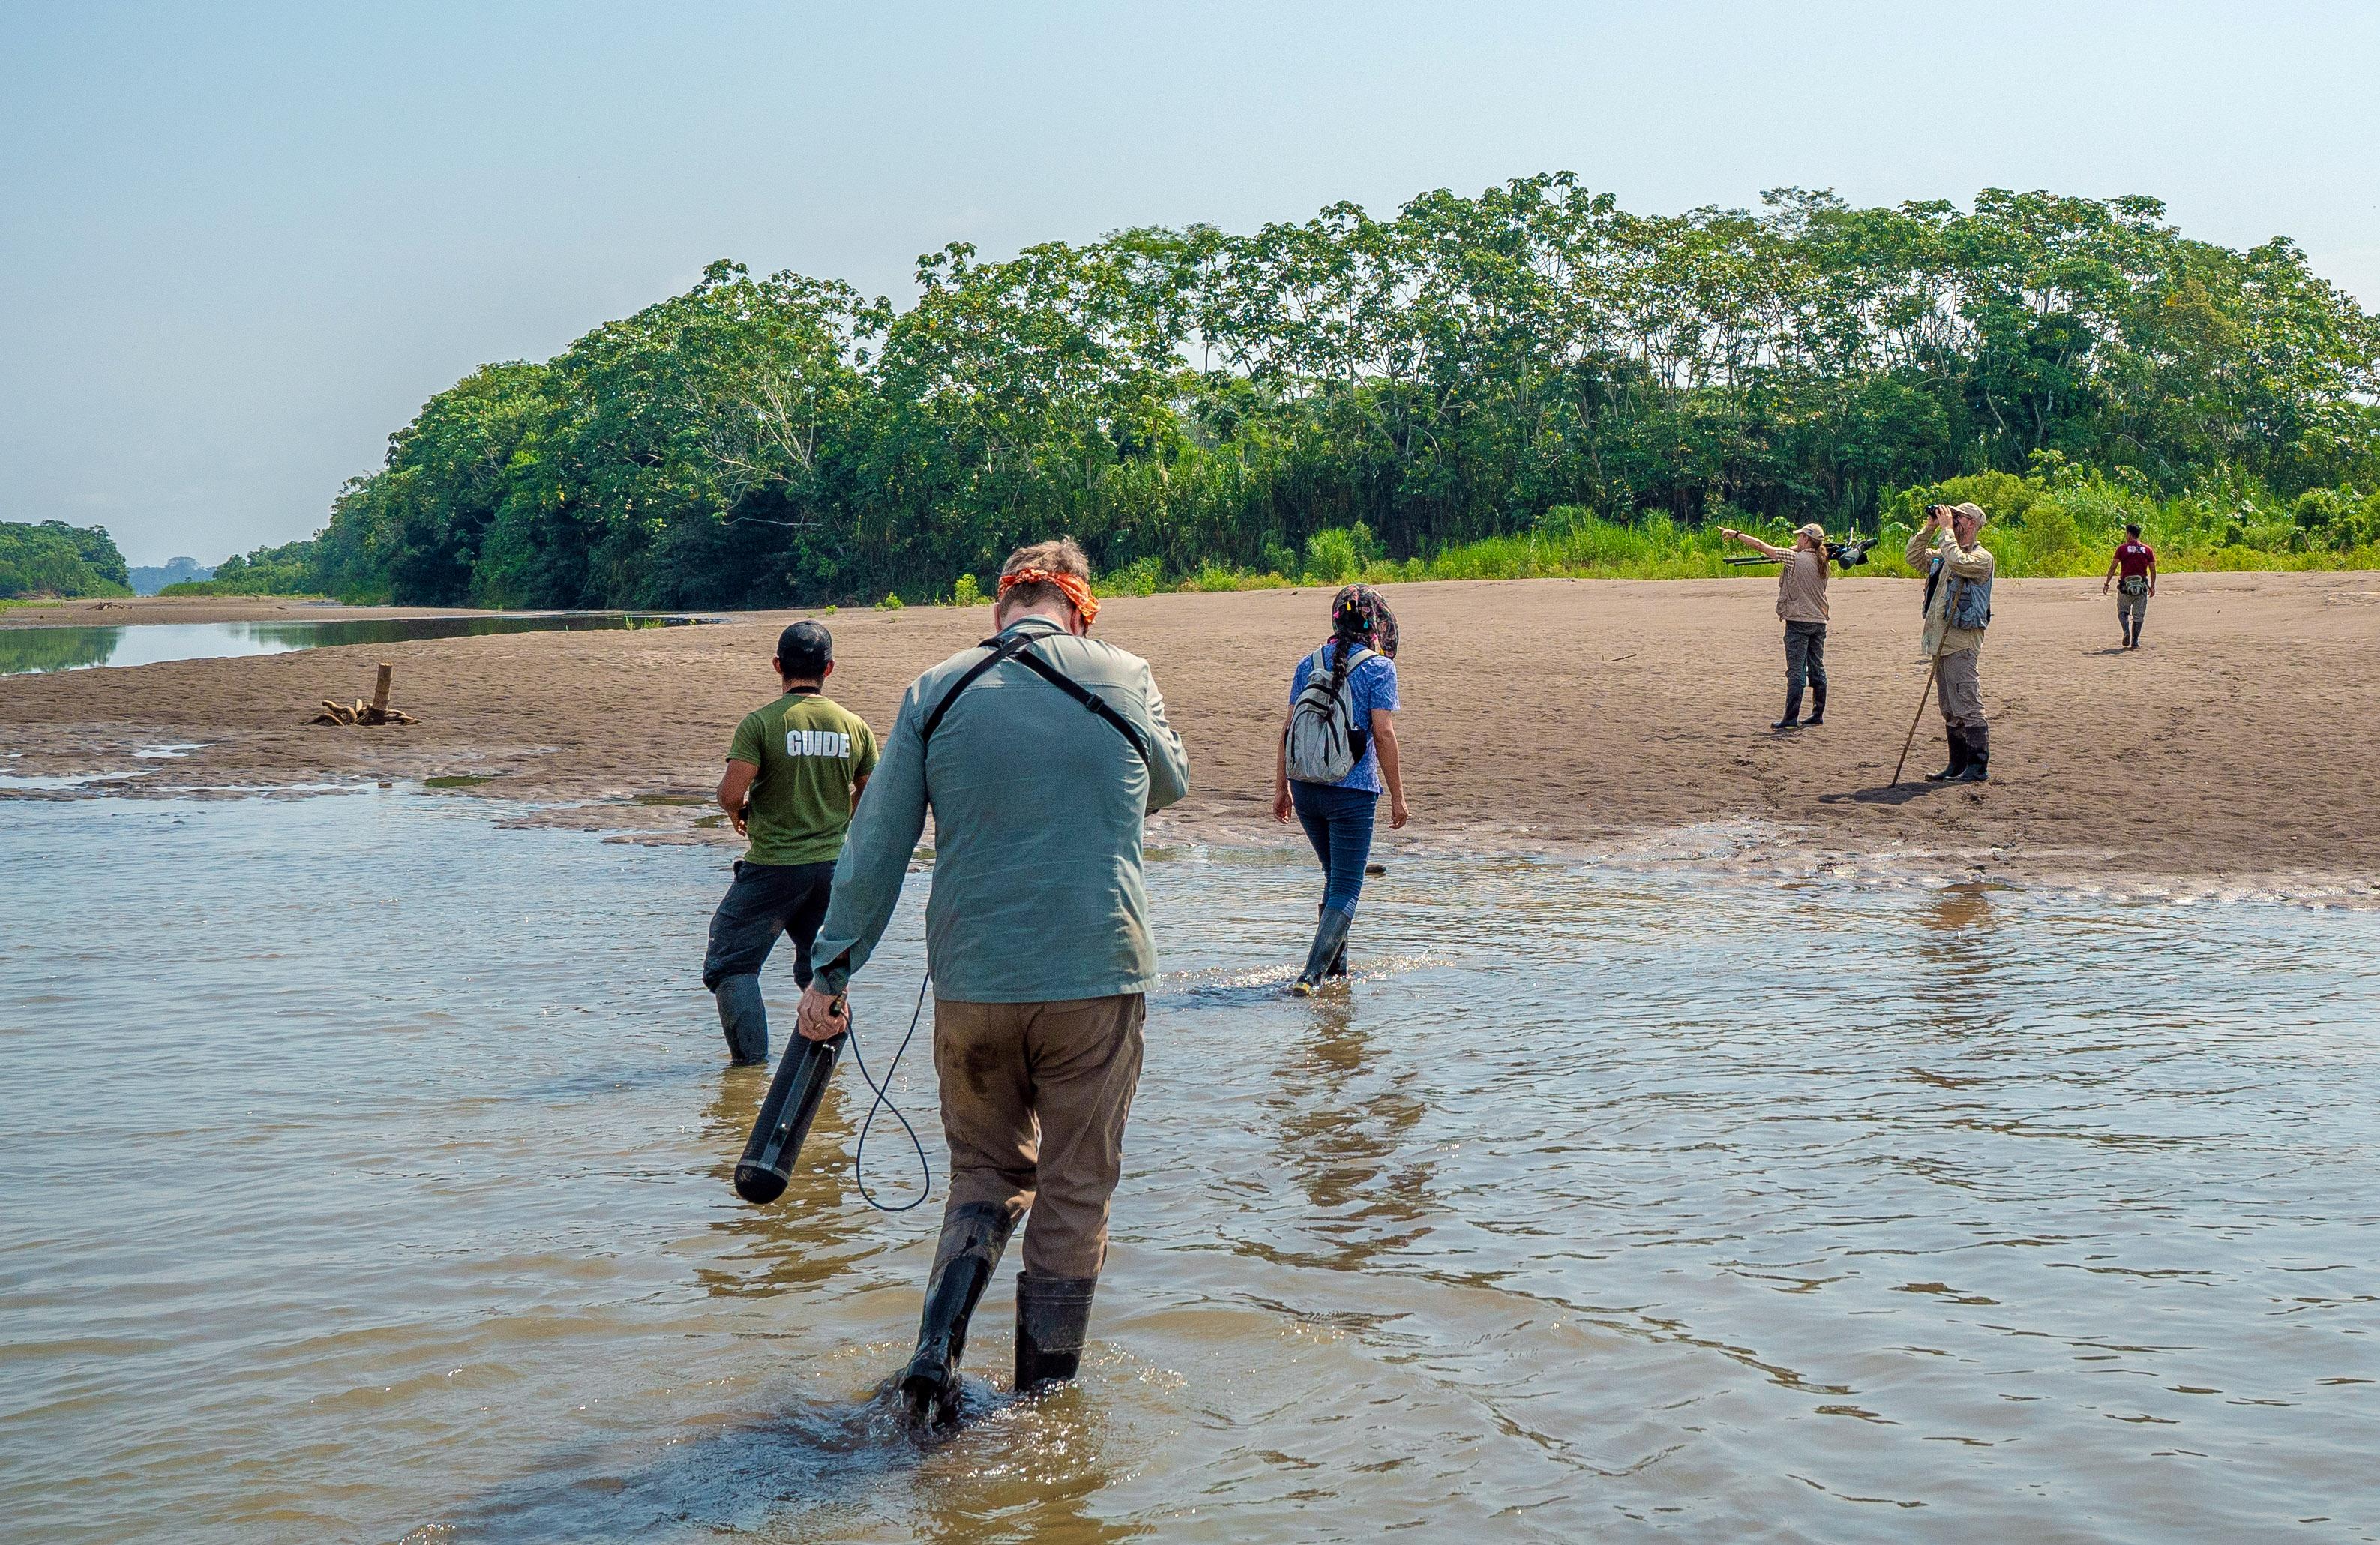 Birding on the River Island